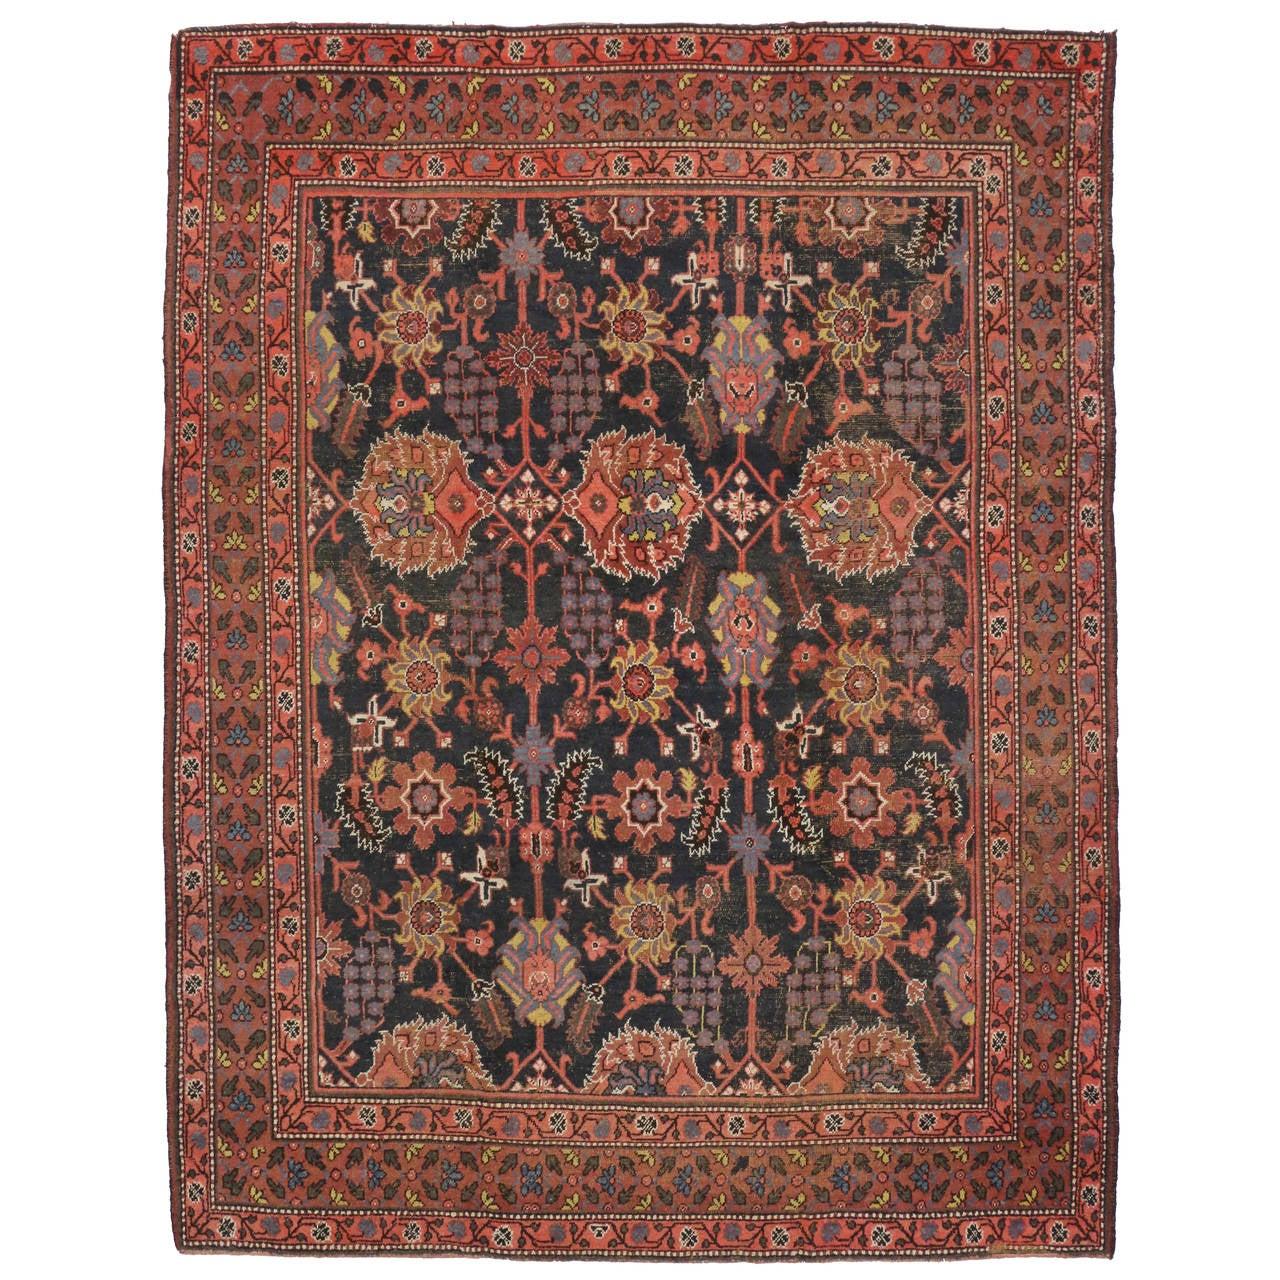 Antique Indian Agra Rug For Sale At 1stdibs: Antique Indian Agra Rug With Modern Design For Sale At 1stdibs